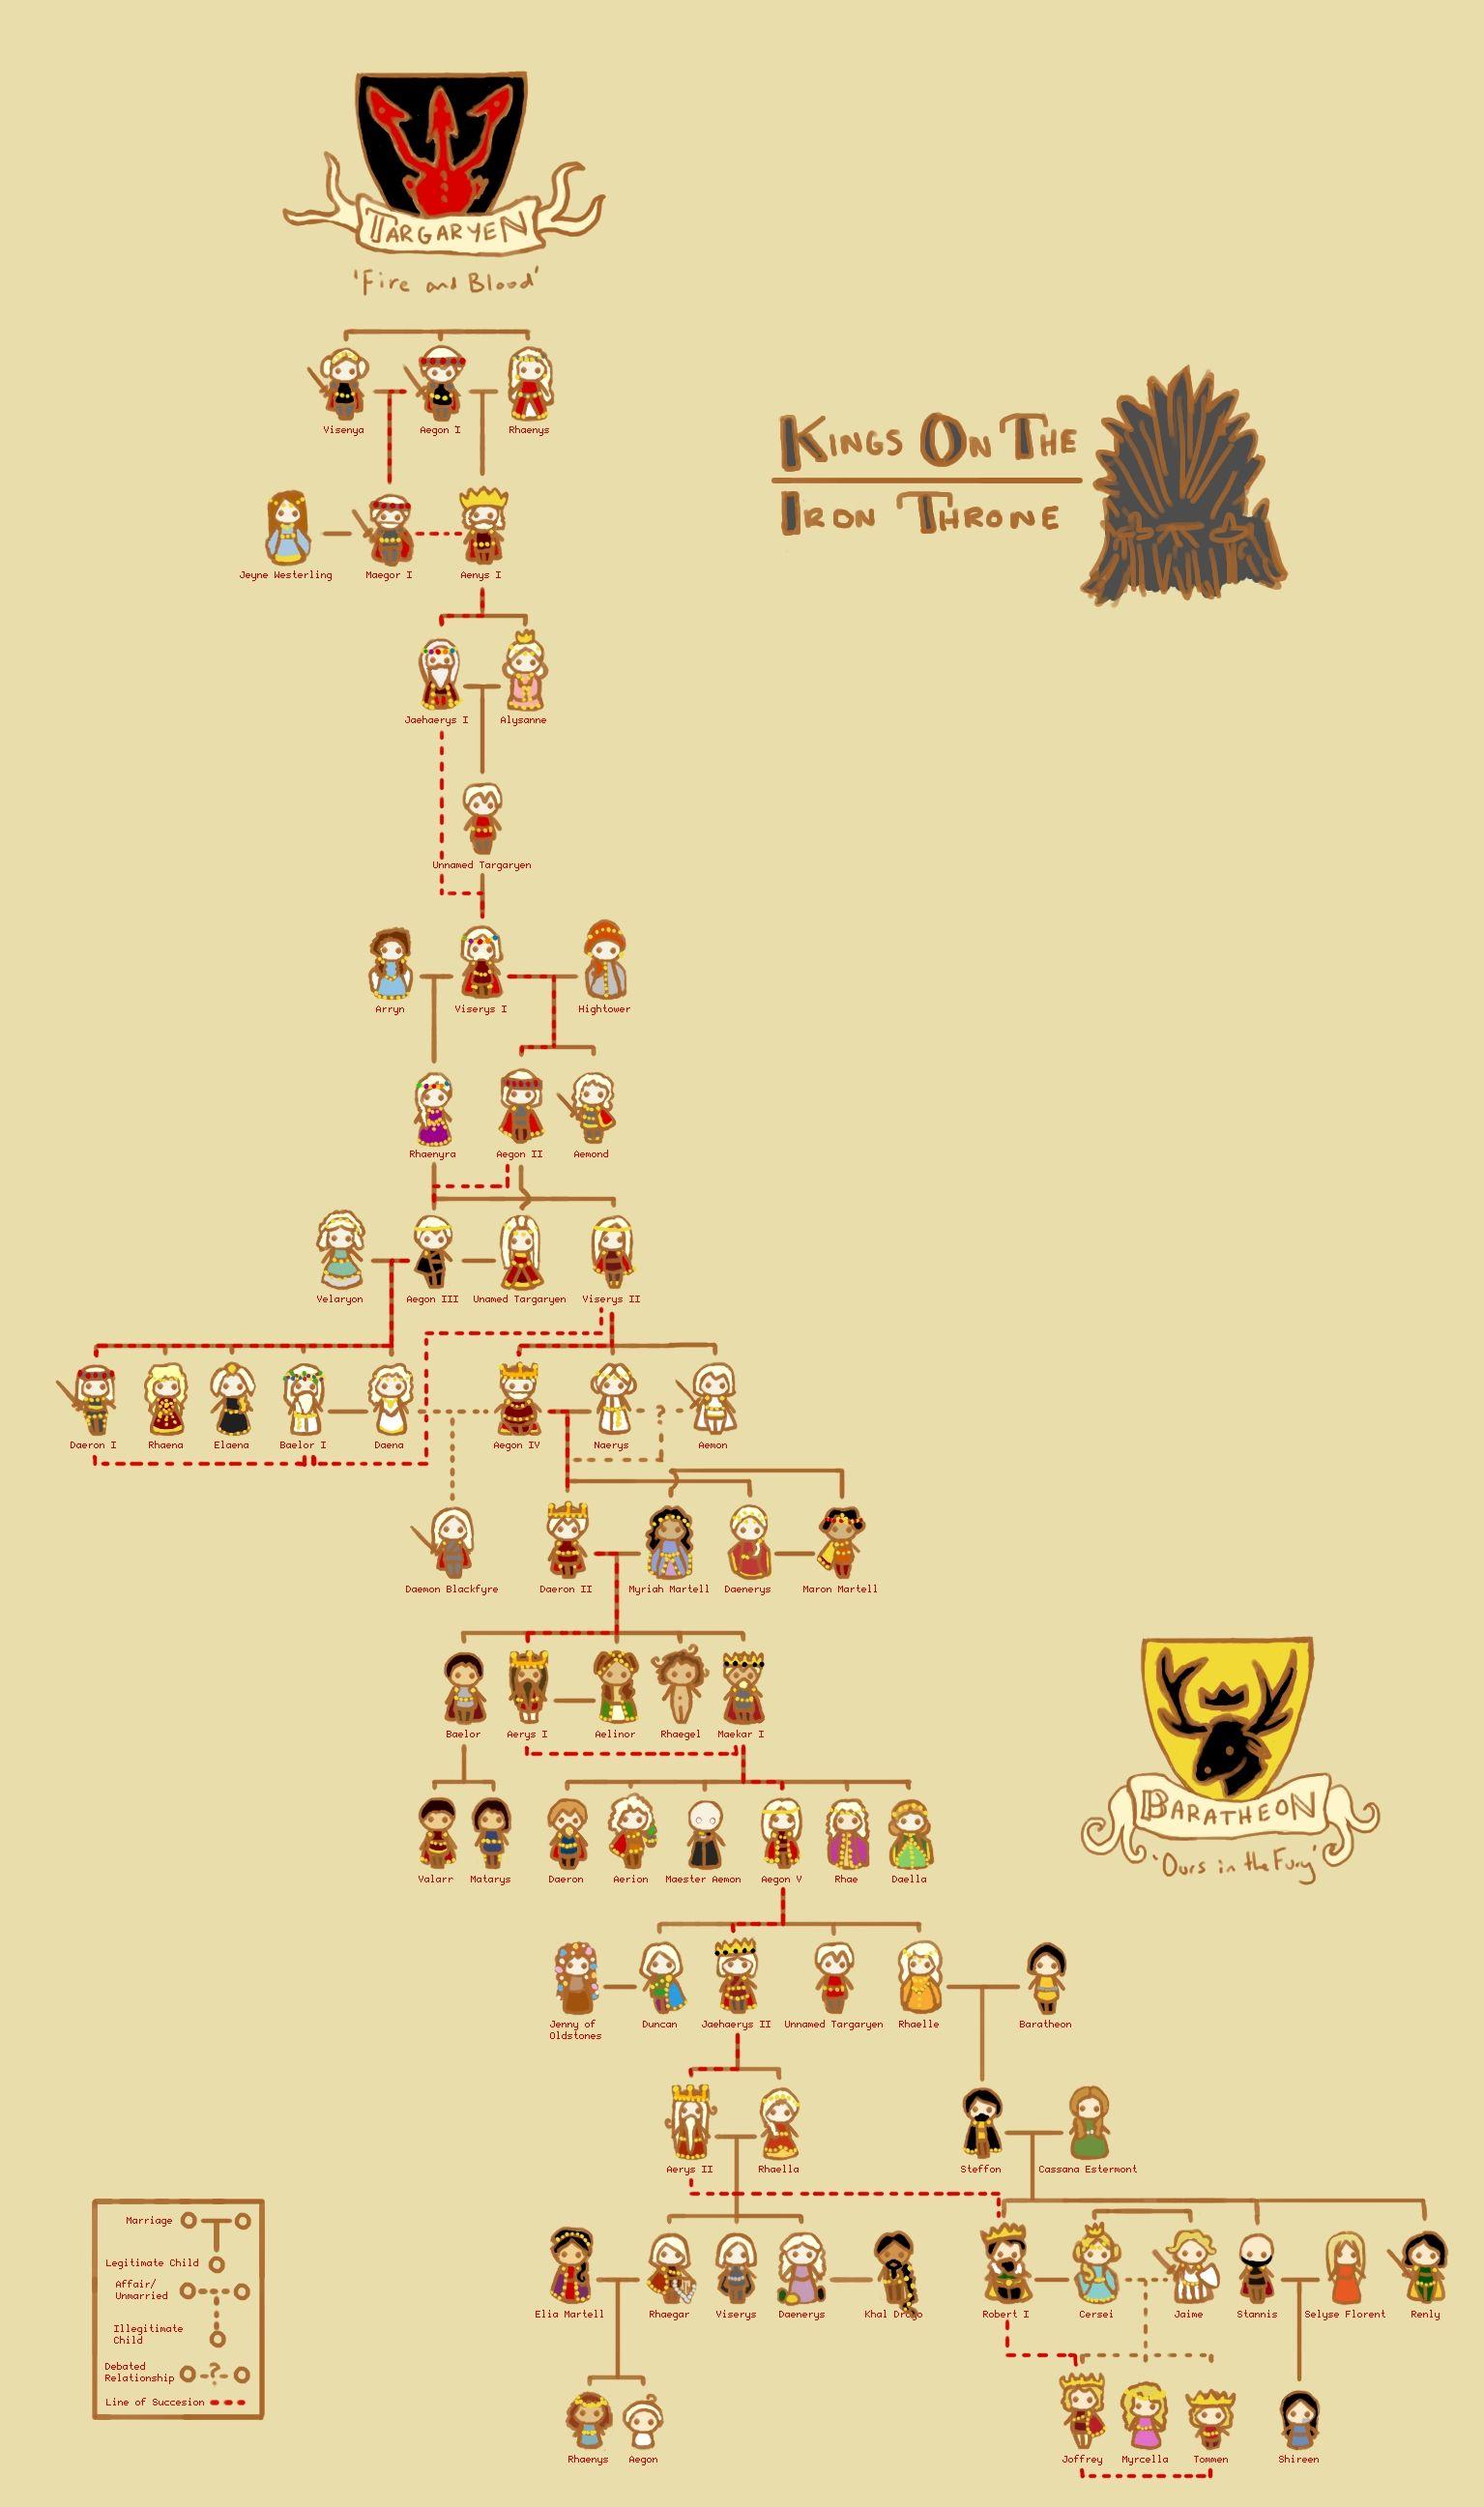 Game Of Thrones Lineage Chart : thrones, lineage, chart, Kings, Throne, Family, Sentienttree.deviantart.com, Targaryen, Tree,, Thrones